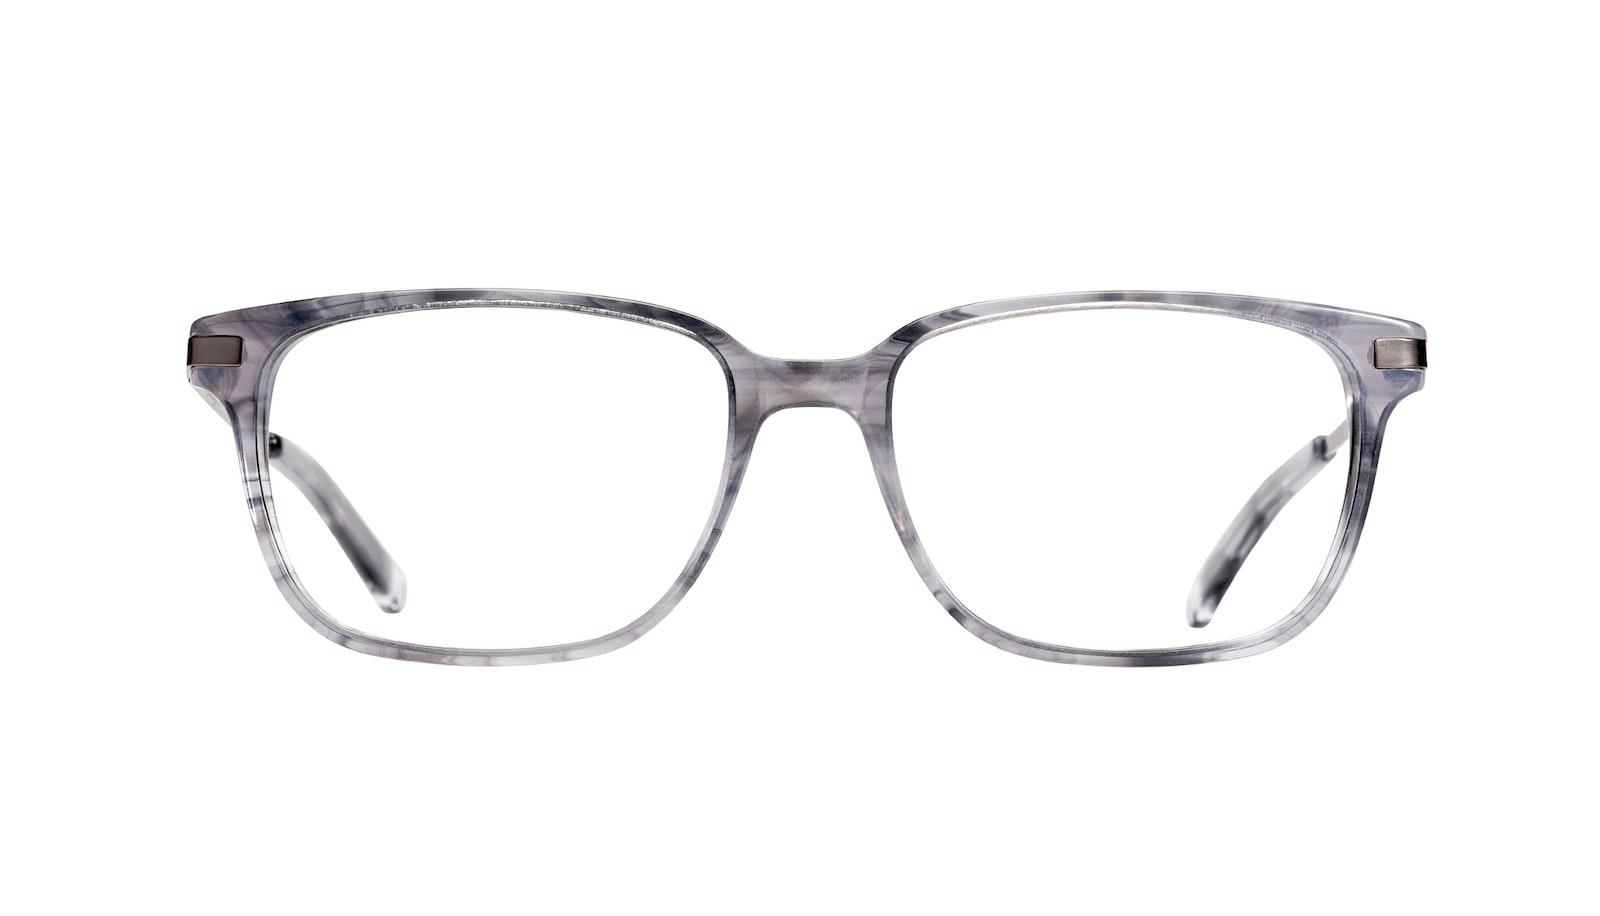 Affordable Fashion Glasses Rectangle Eyeglasses Men Trade Smokey Grey